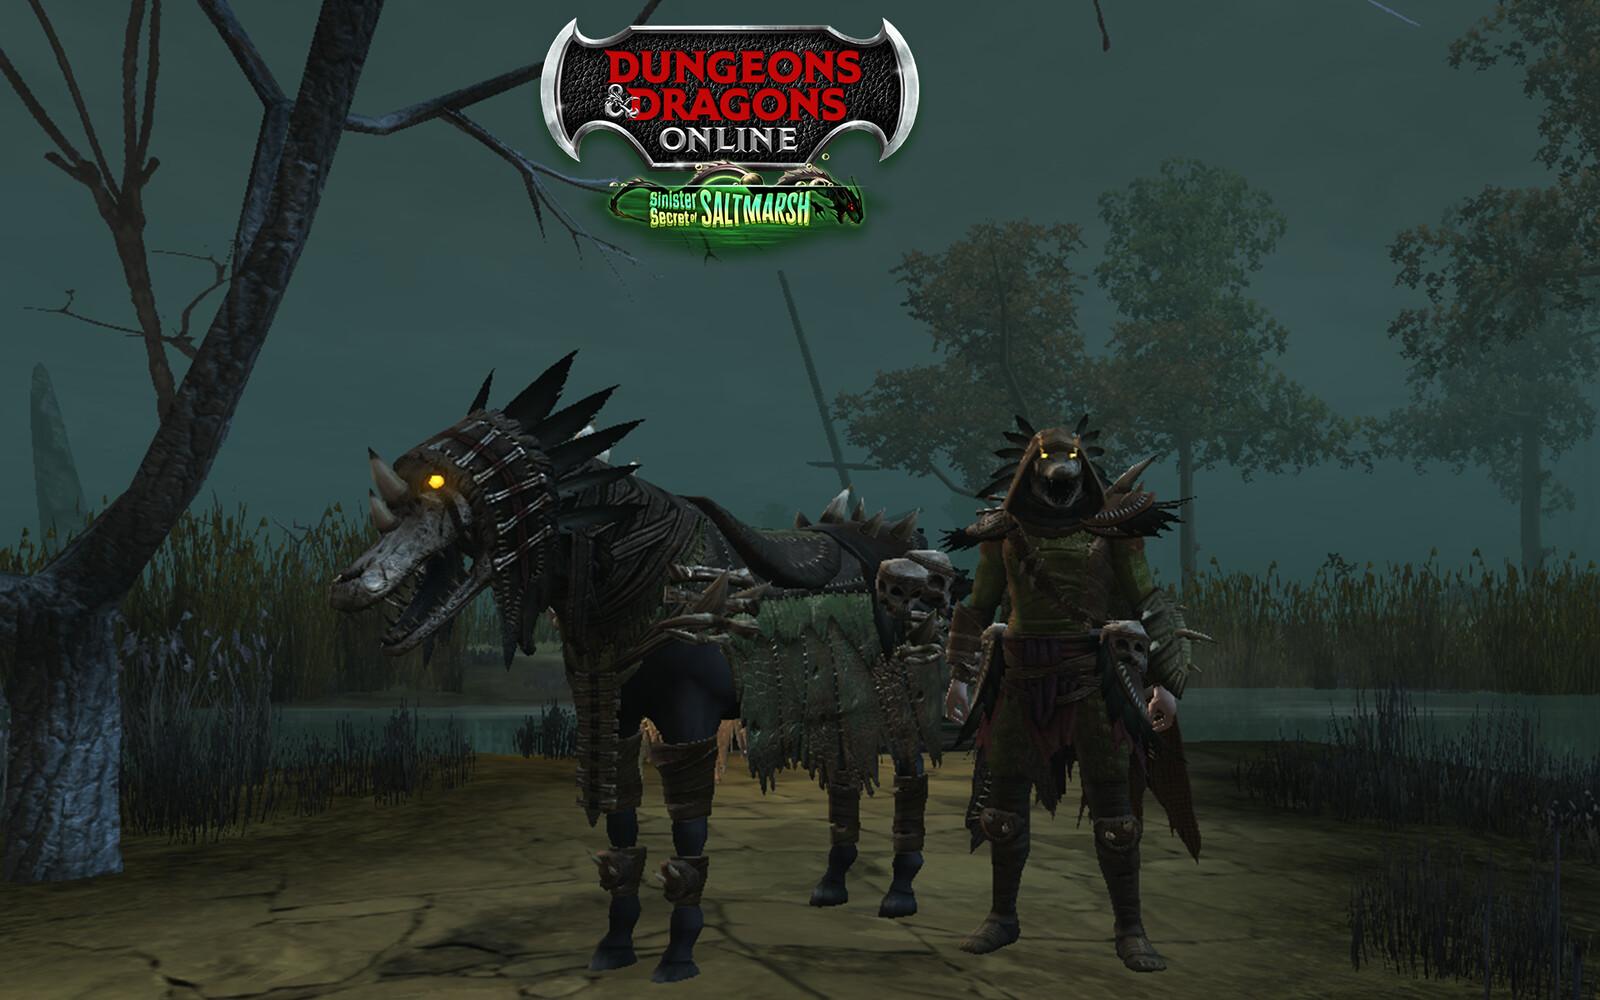 Dungeons and Dragons Online Lizardfolk Cosmetic Set and Mount Sinister Secrets of Saltmarsh Mini-Expansion 2021 Ultimate Fan Bundle Reward In-Game Screenshot